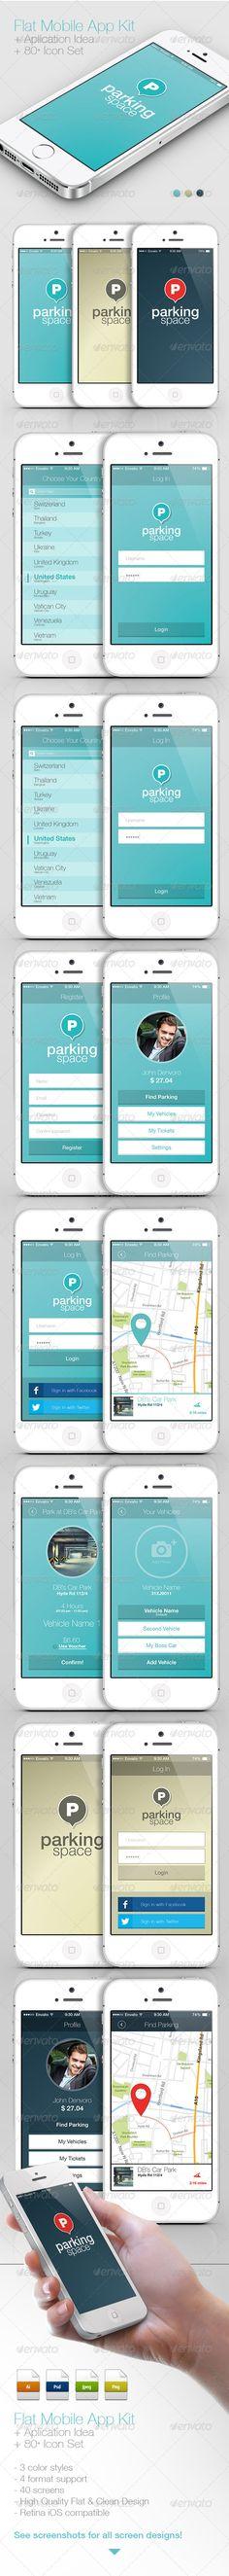 Flat Mobile App Kit / App Idea / Icon Set